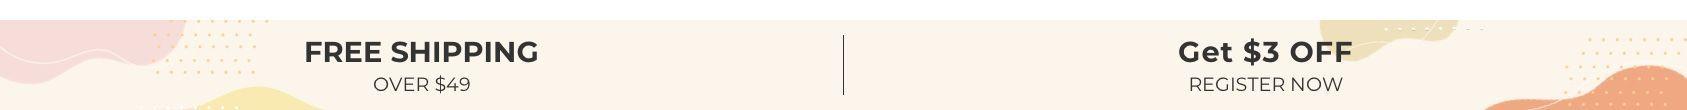 img_https://cdn-1.blushmark.com/blushmark/upimg/2d/ab/3e8c722f304ef08da0022f4ac830a66c7ed72dab.jpg